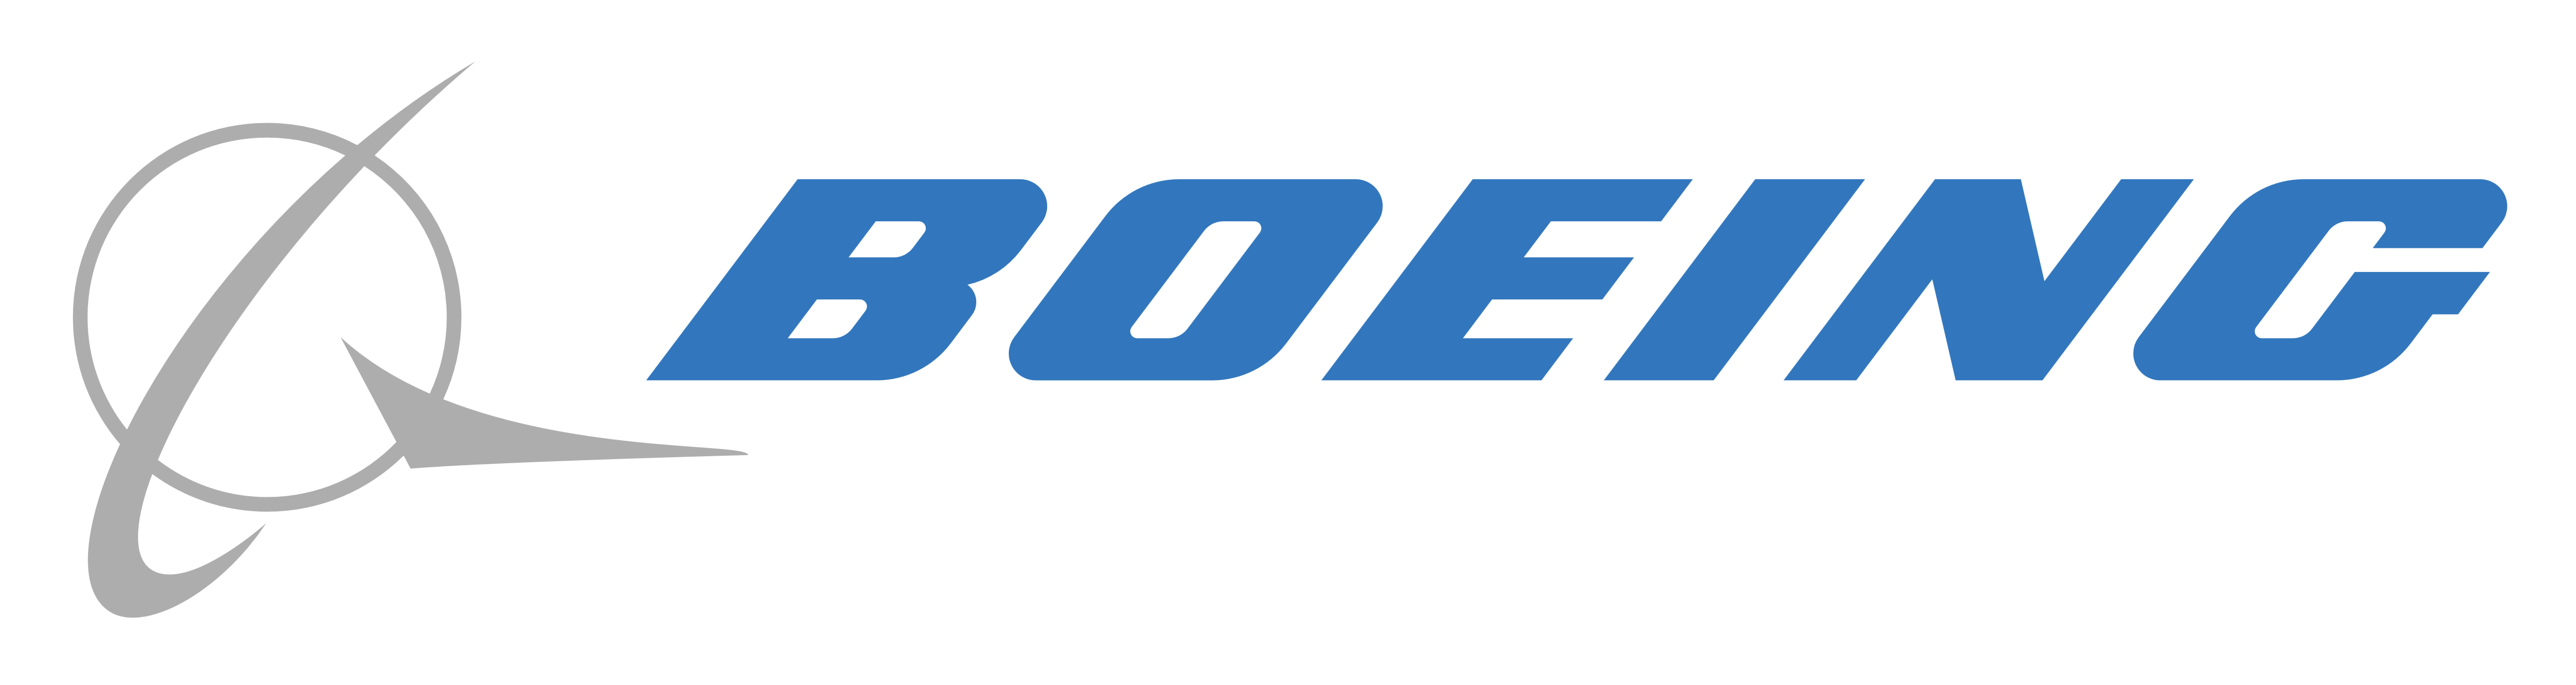 Download Boeing Logo PNG - 38795